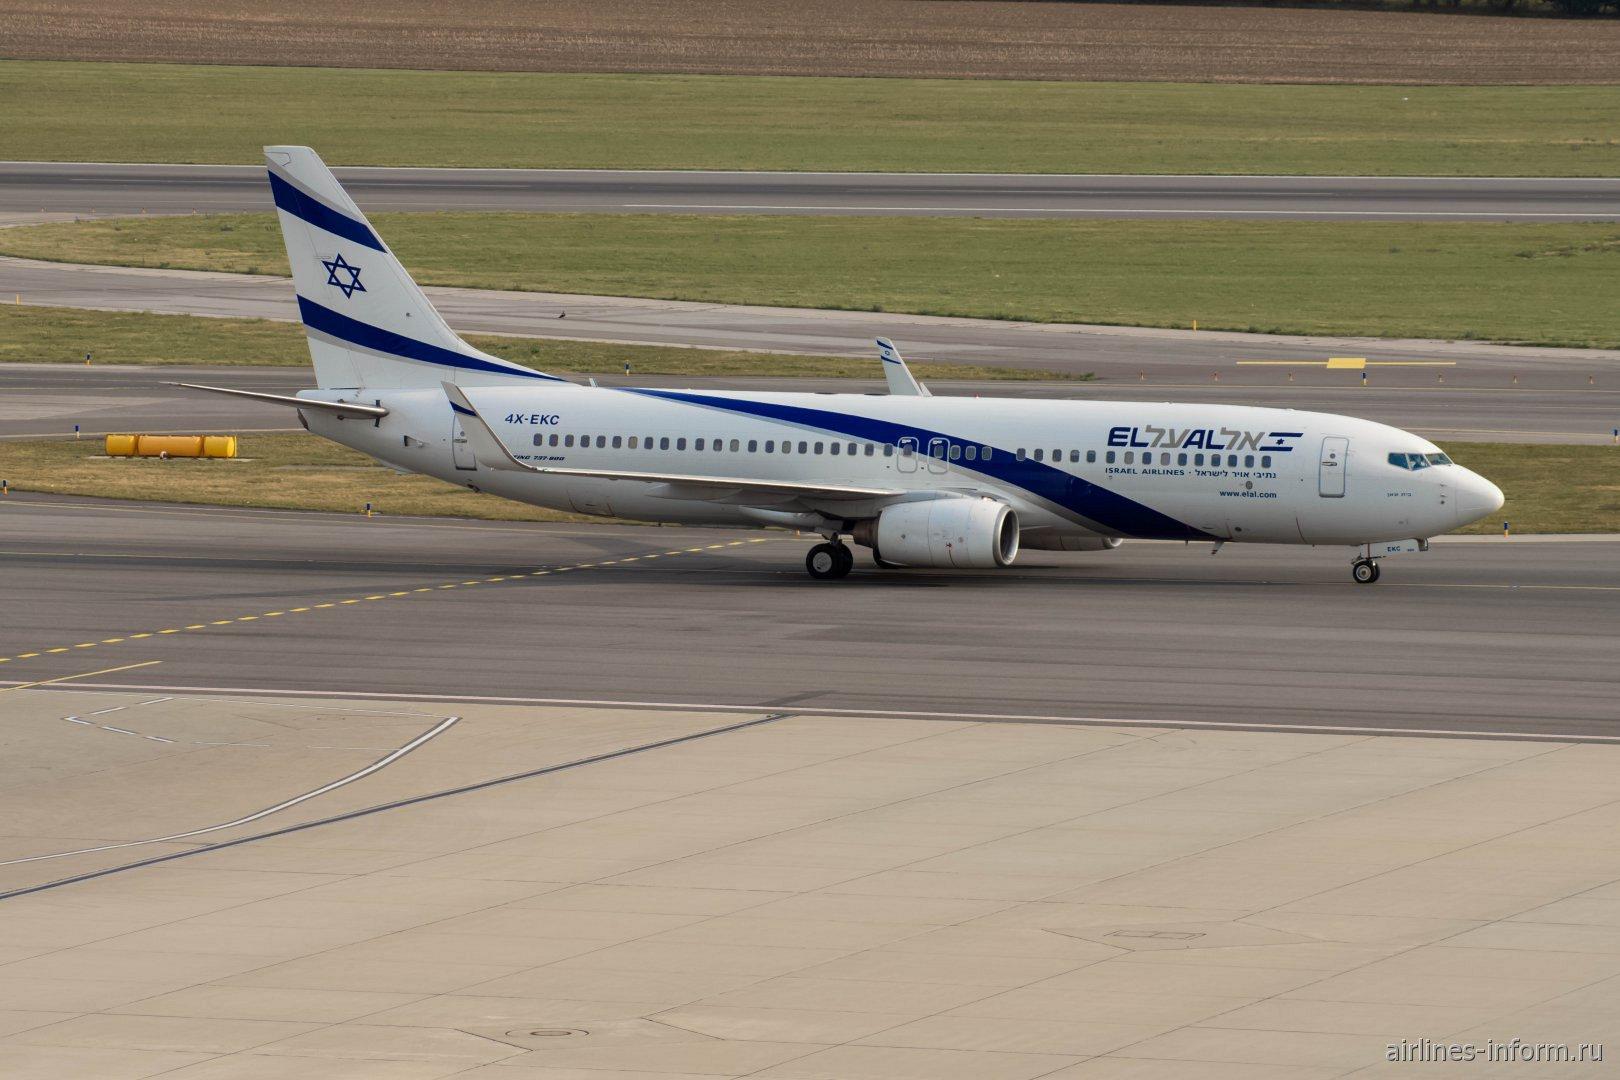 Боинг-737-800 4X-EKC авиакомпании EL AL в аэропорту Вена Швехат